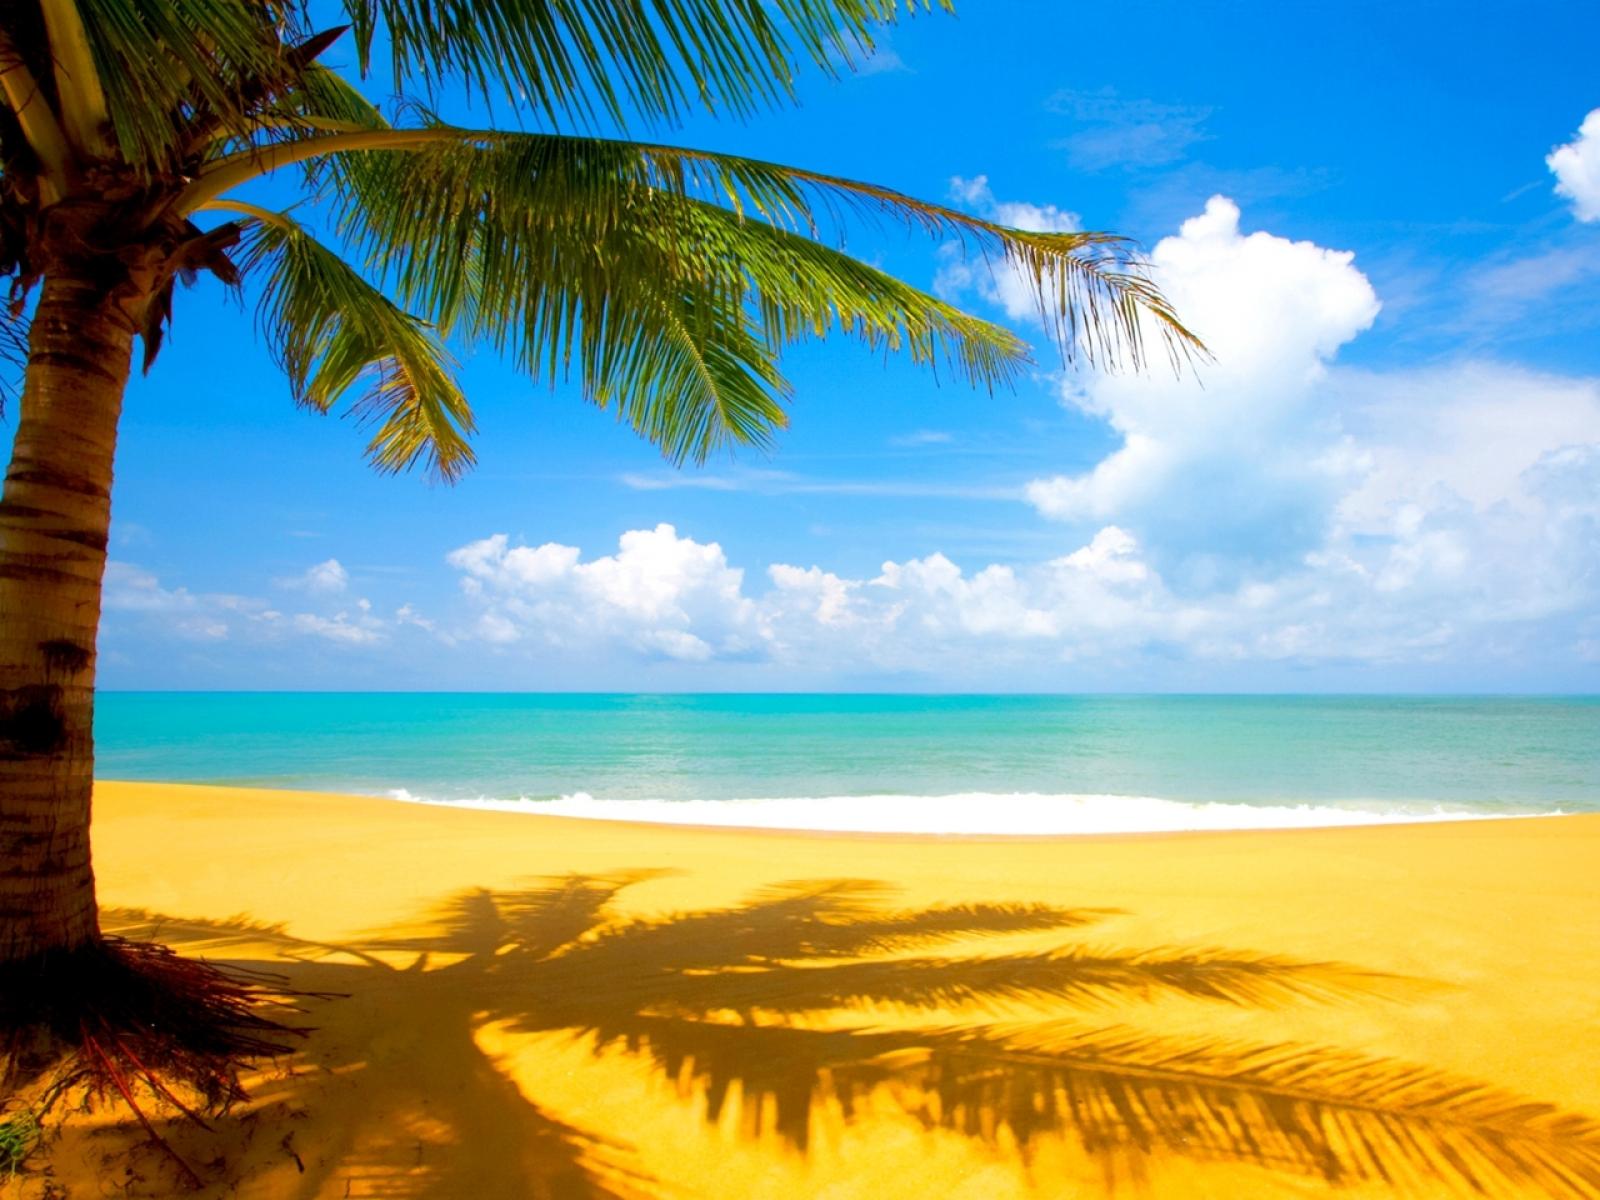 Ocean Beach HD Wallpapers 1600x1200